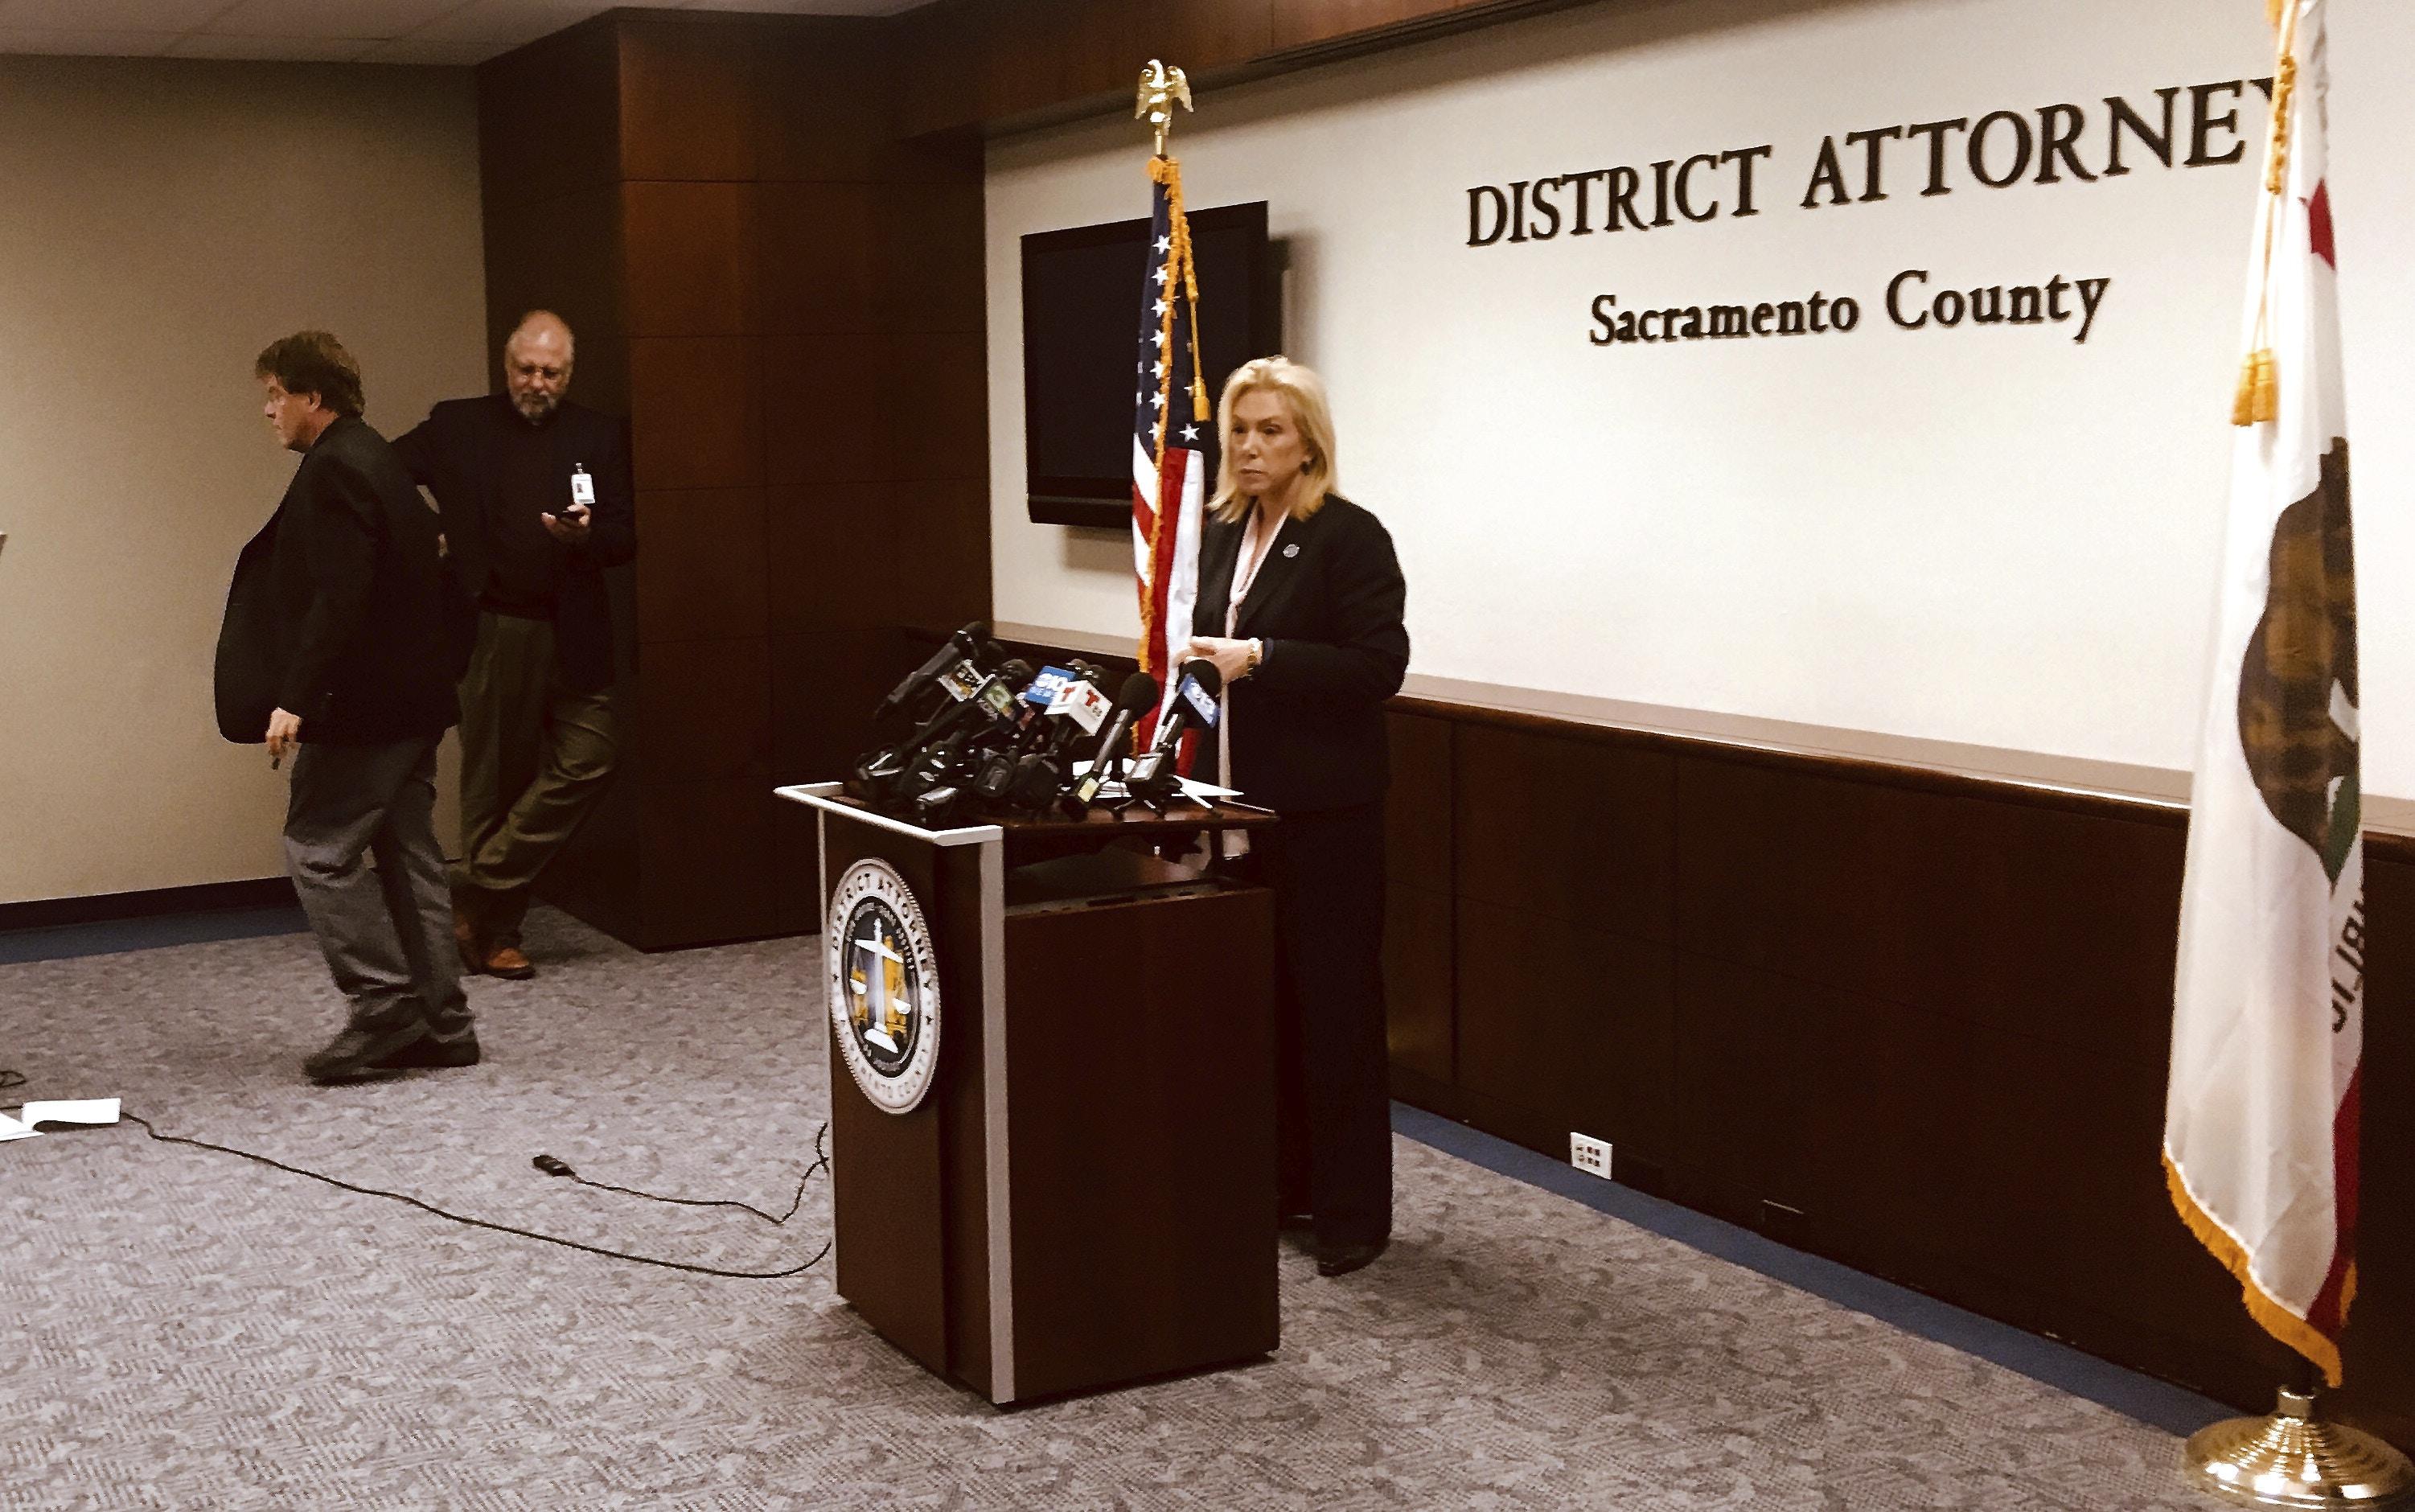 Police Groups Spent Nearly Half a Million on Sacramento DA